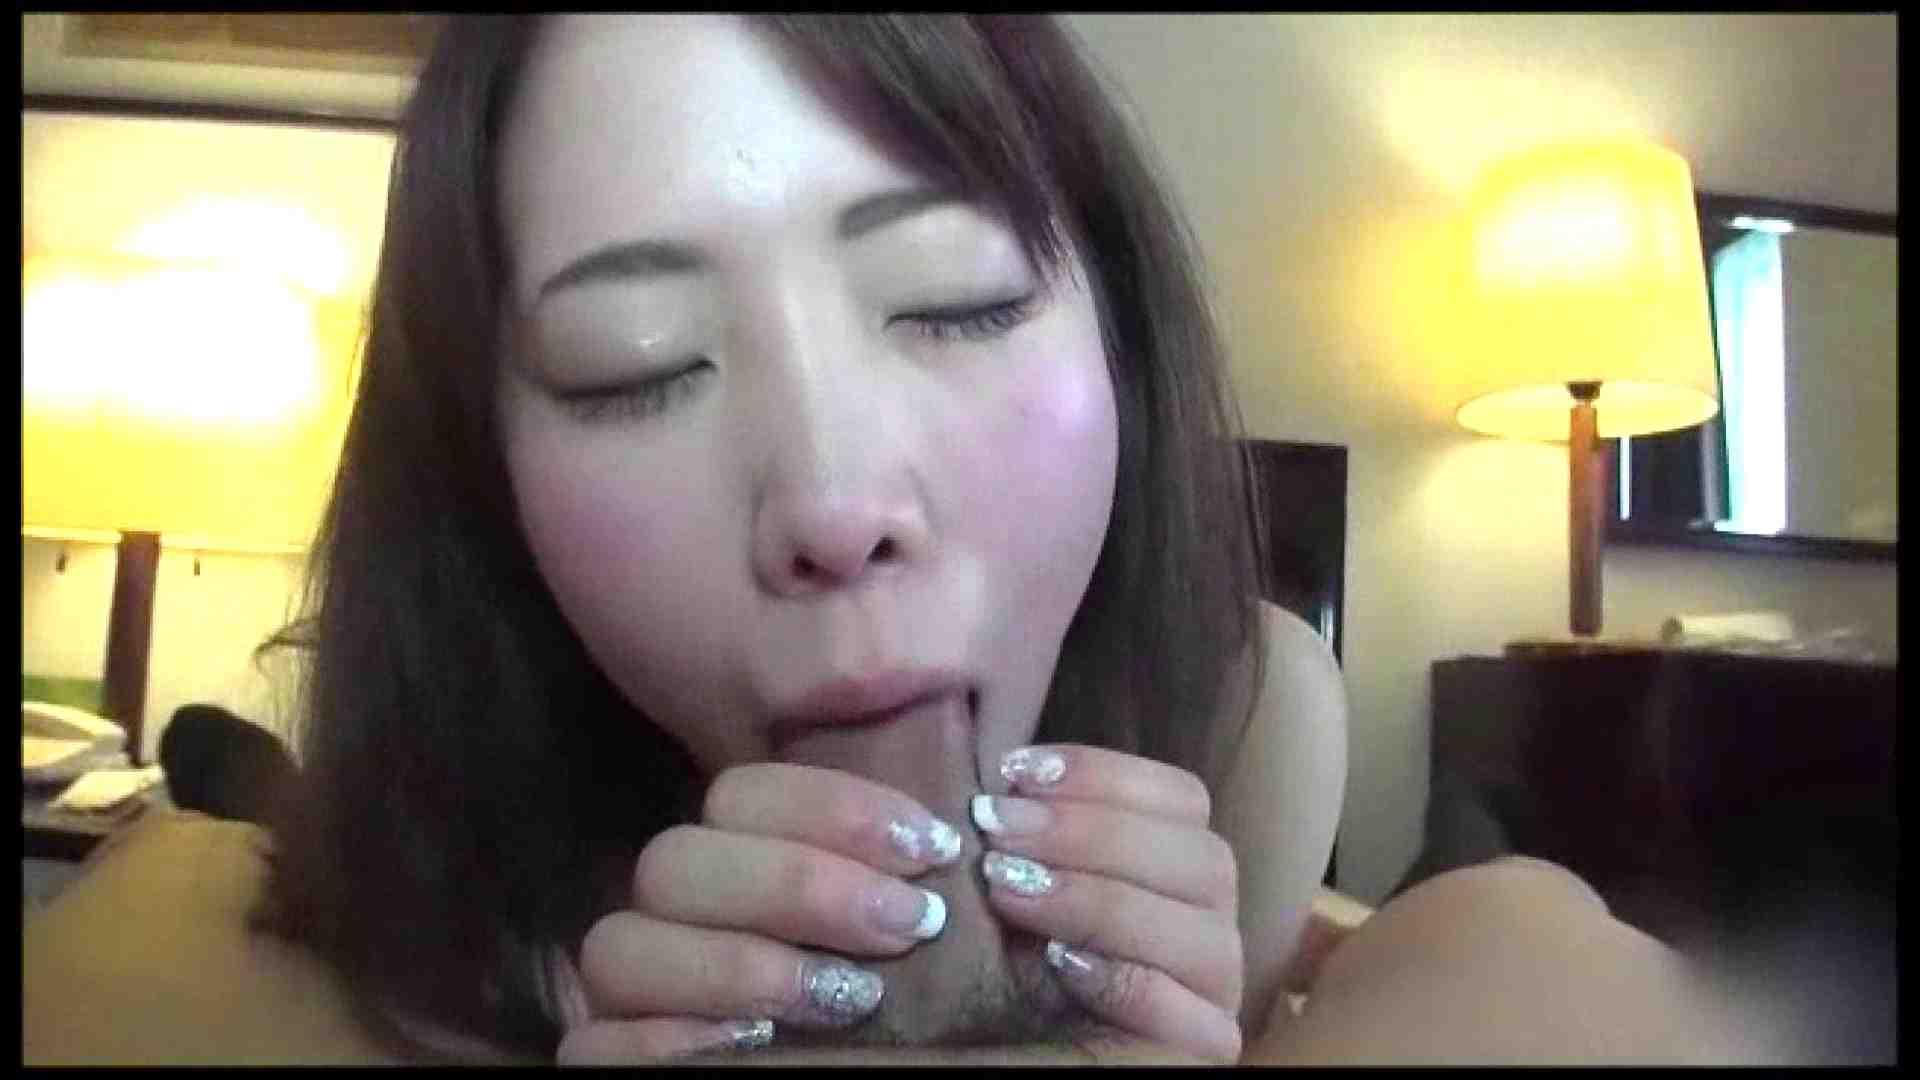 ハメ撮り天国 Vol.37 流出作品  55連発 25